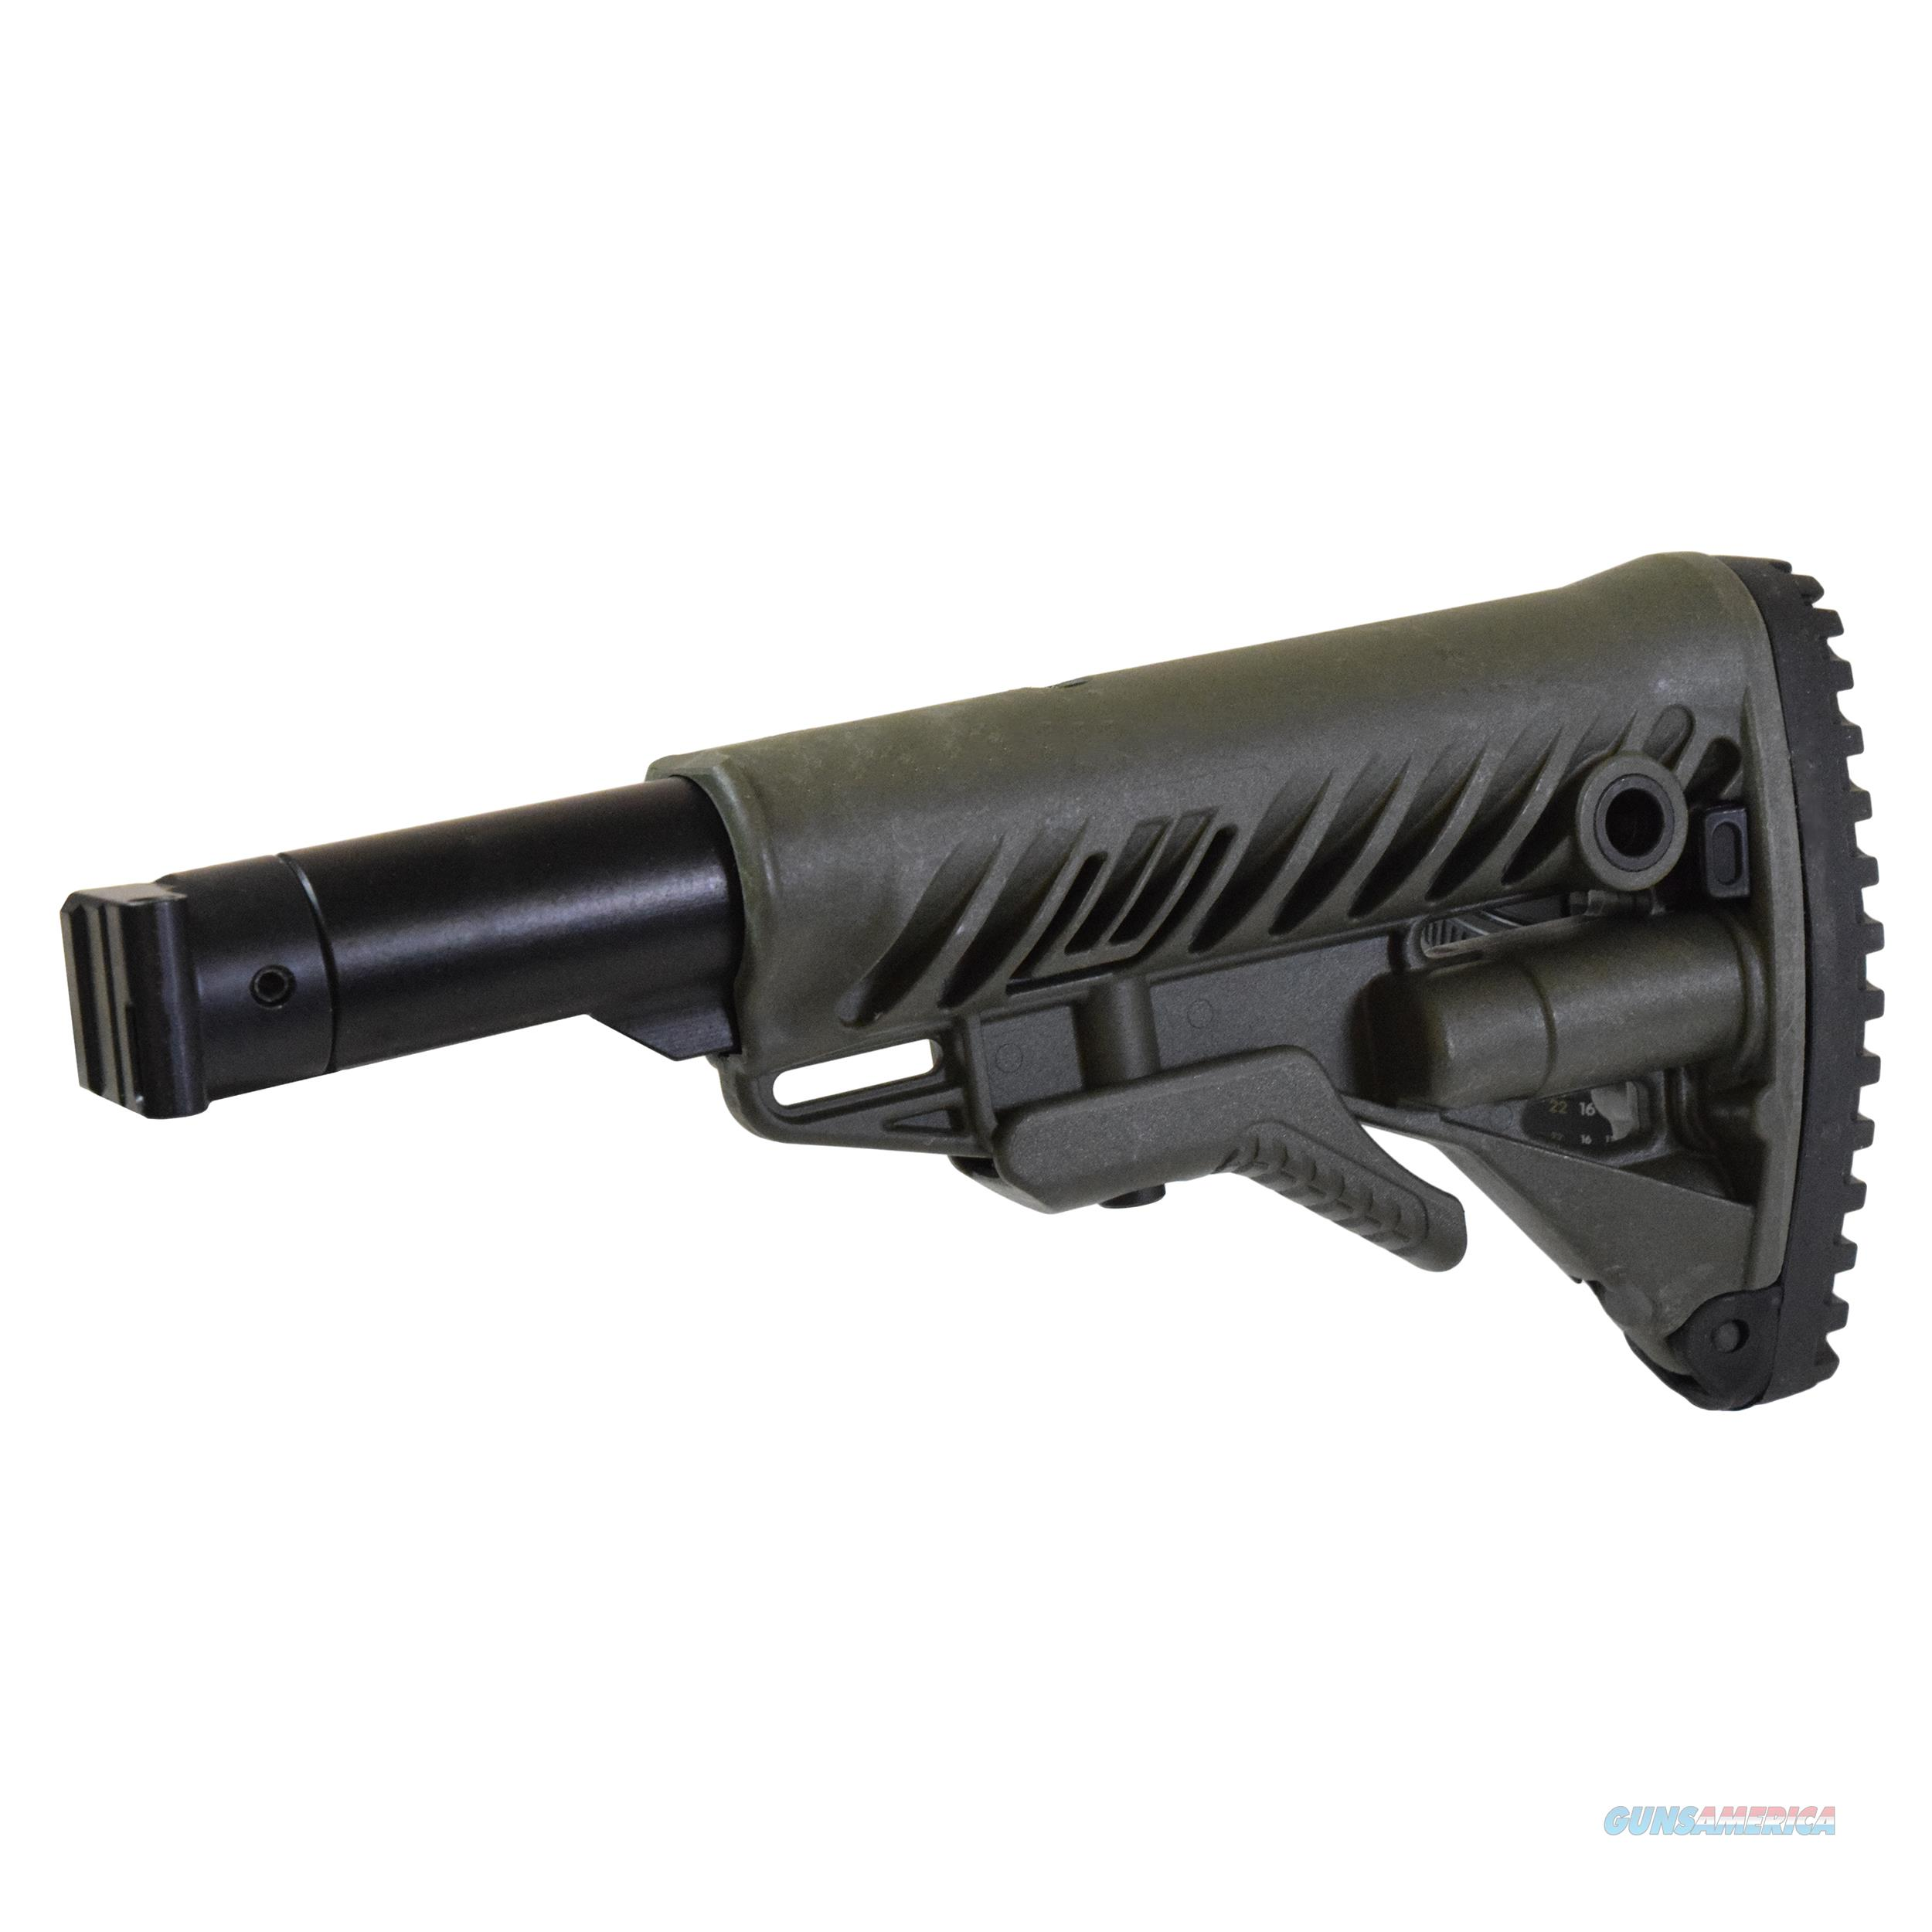 Mako Group Folding Ccollapsible Buttstock System M4-SAIGA-OD  Non-Guns > Gunstocks, Grips & Wood